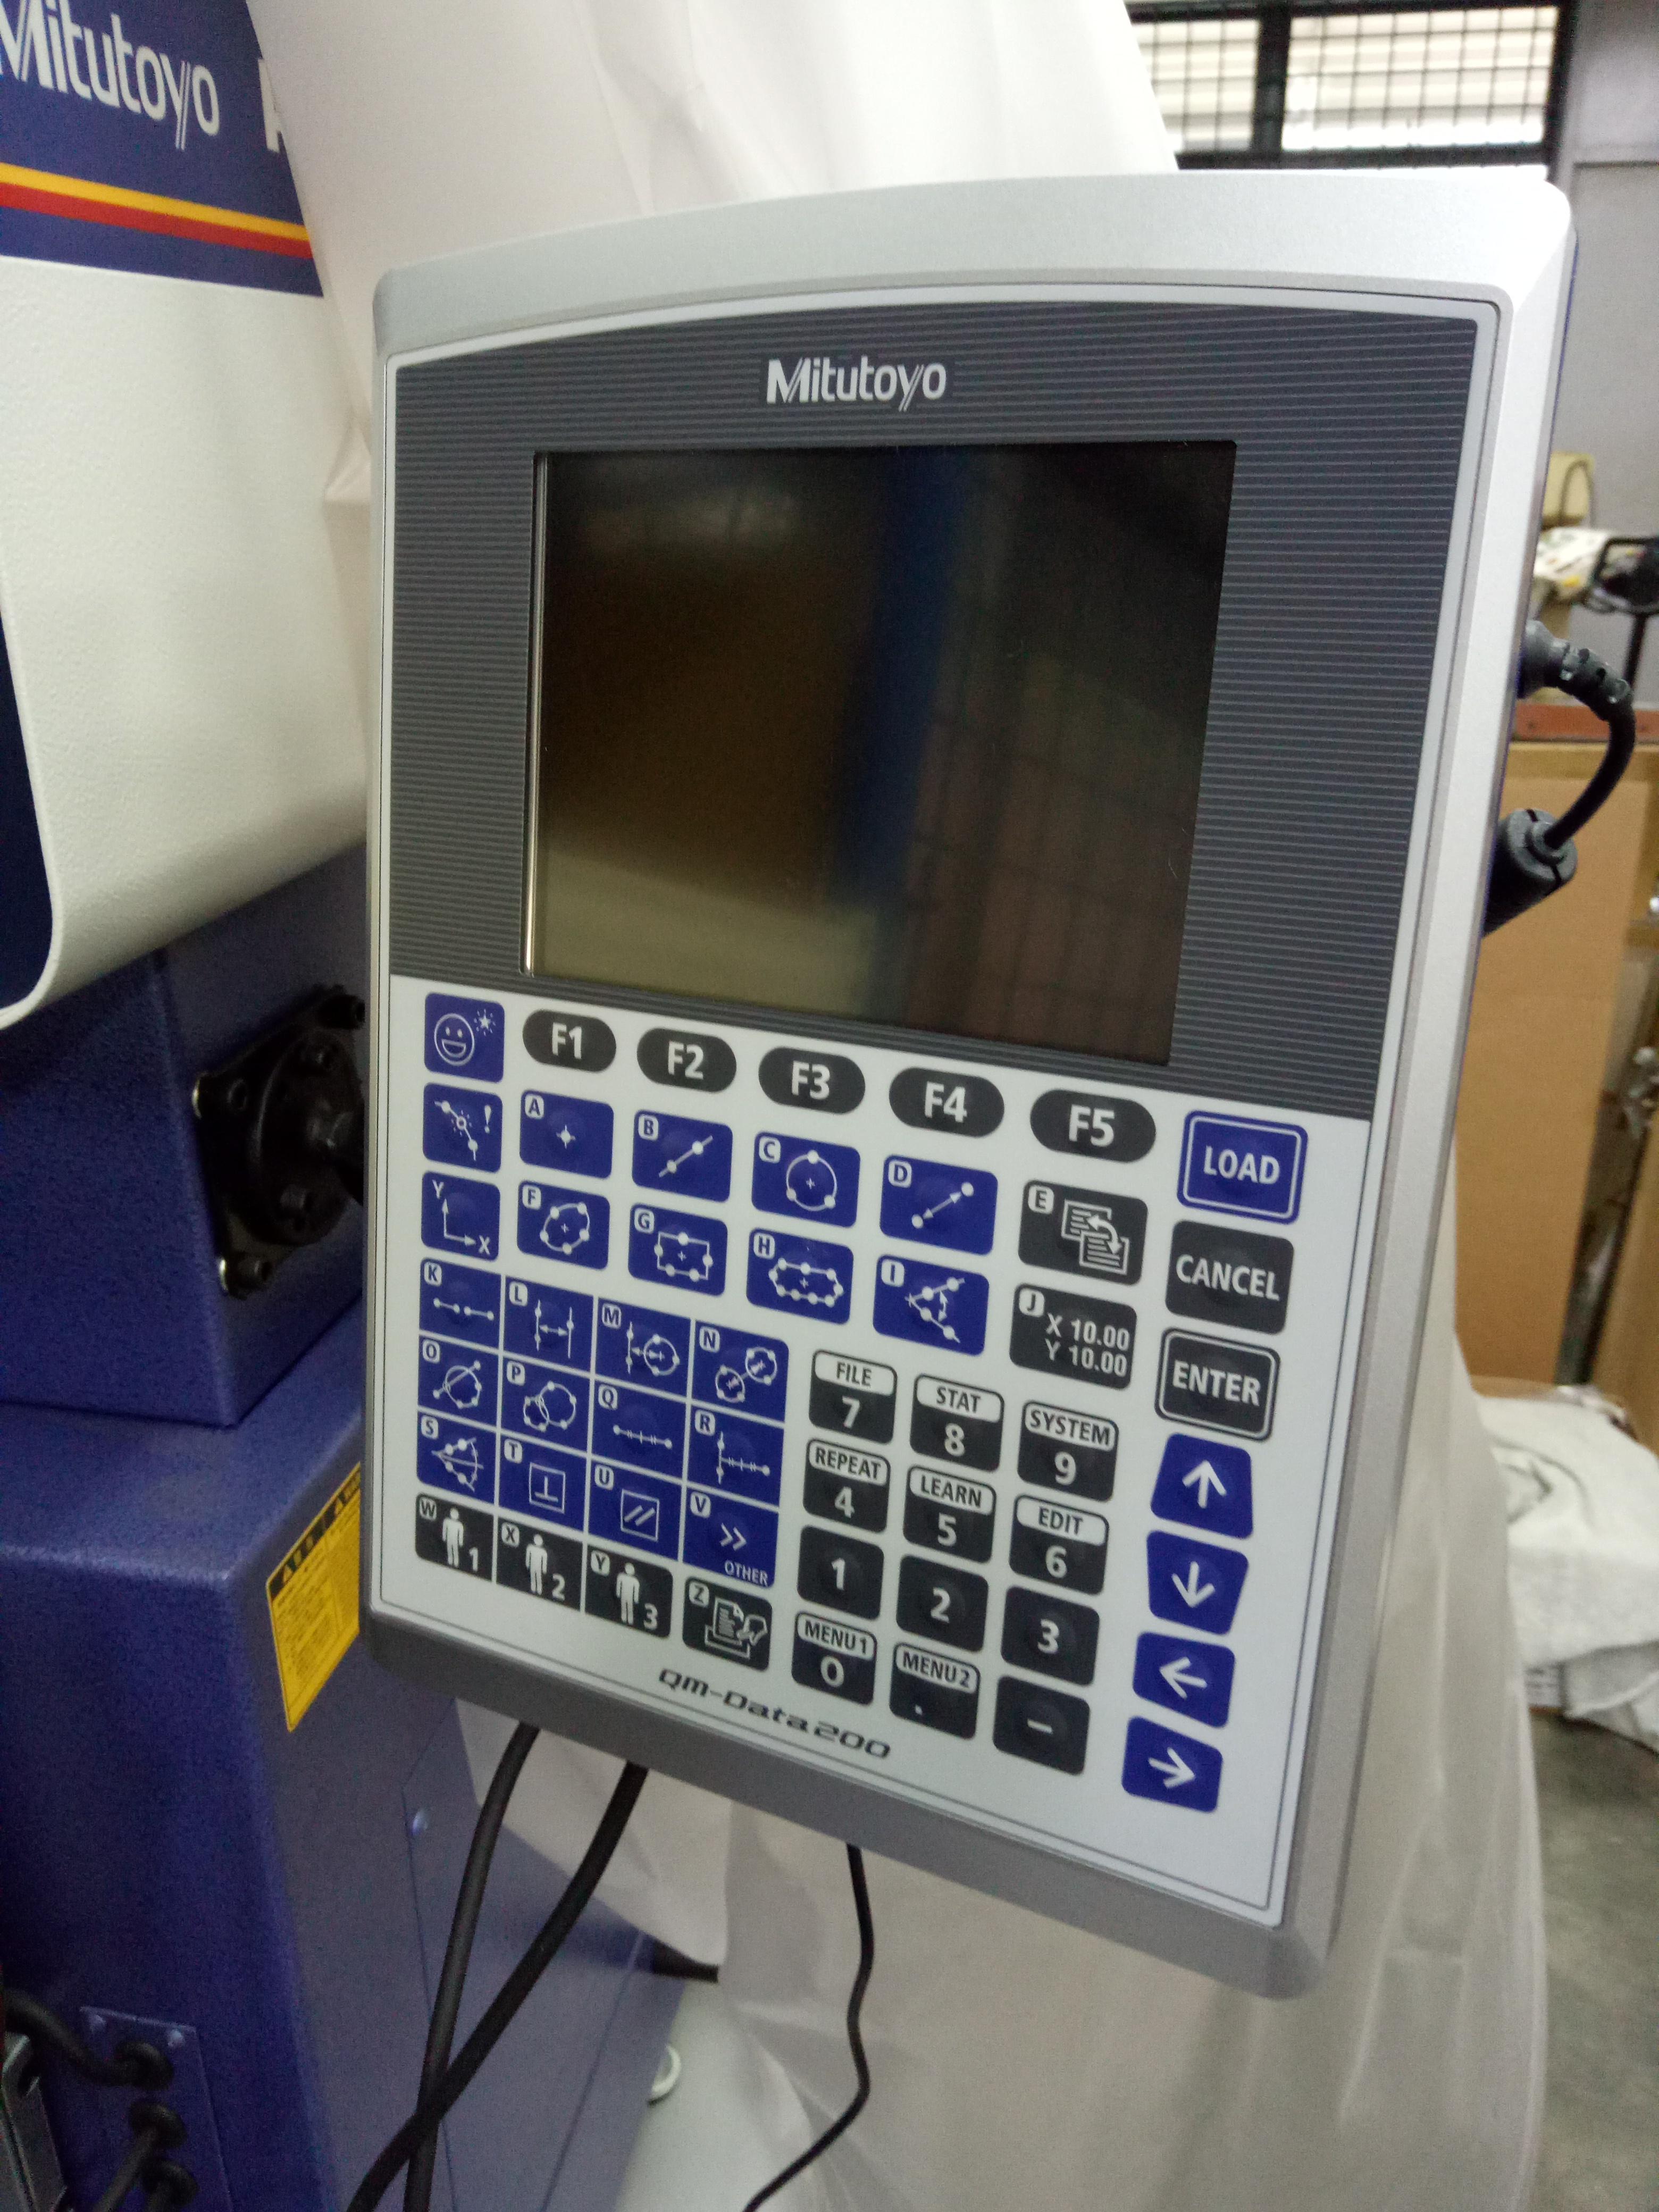 Mitutoyo PH 3500 Profile projector - Exapro